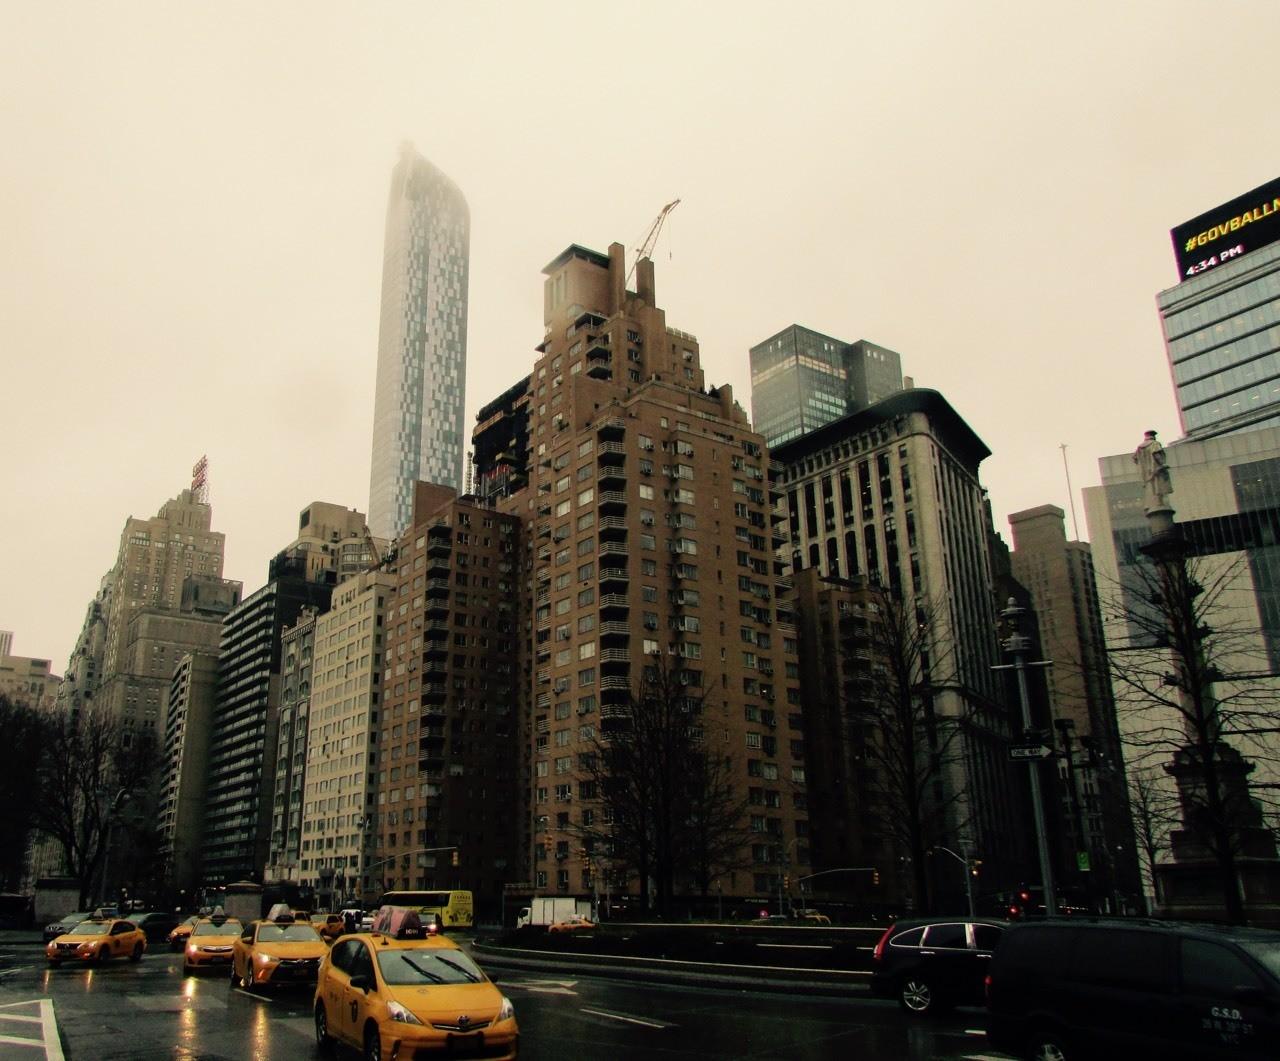 New York - mist, rain and gloom...